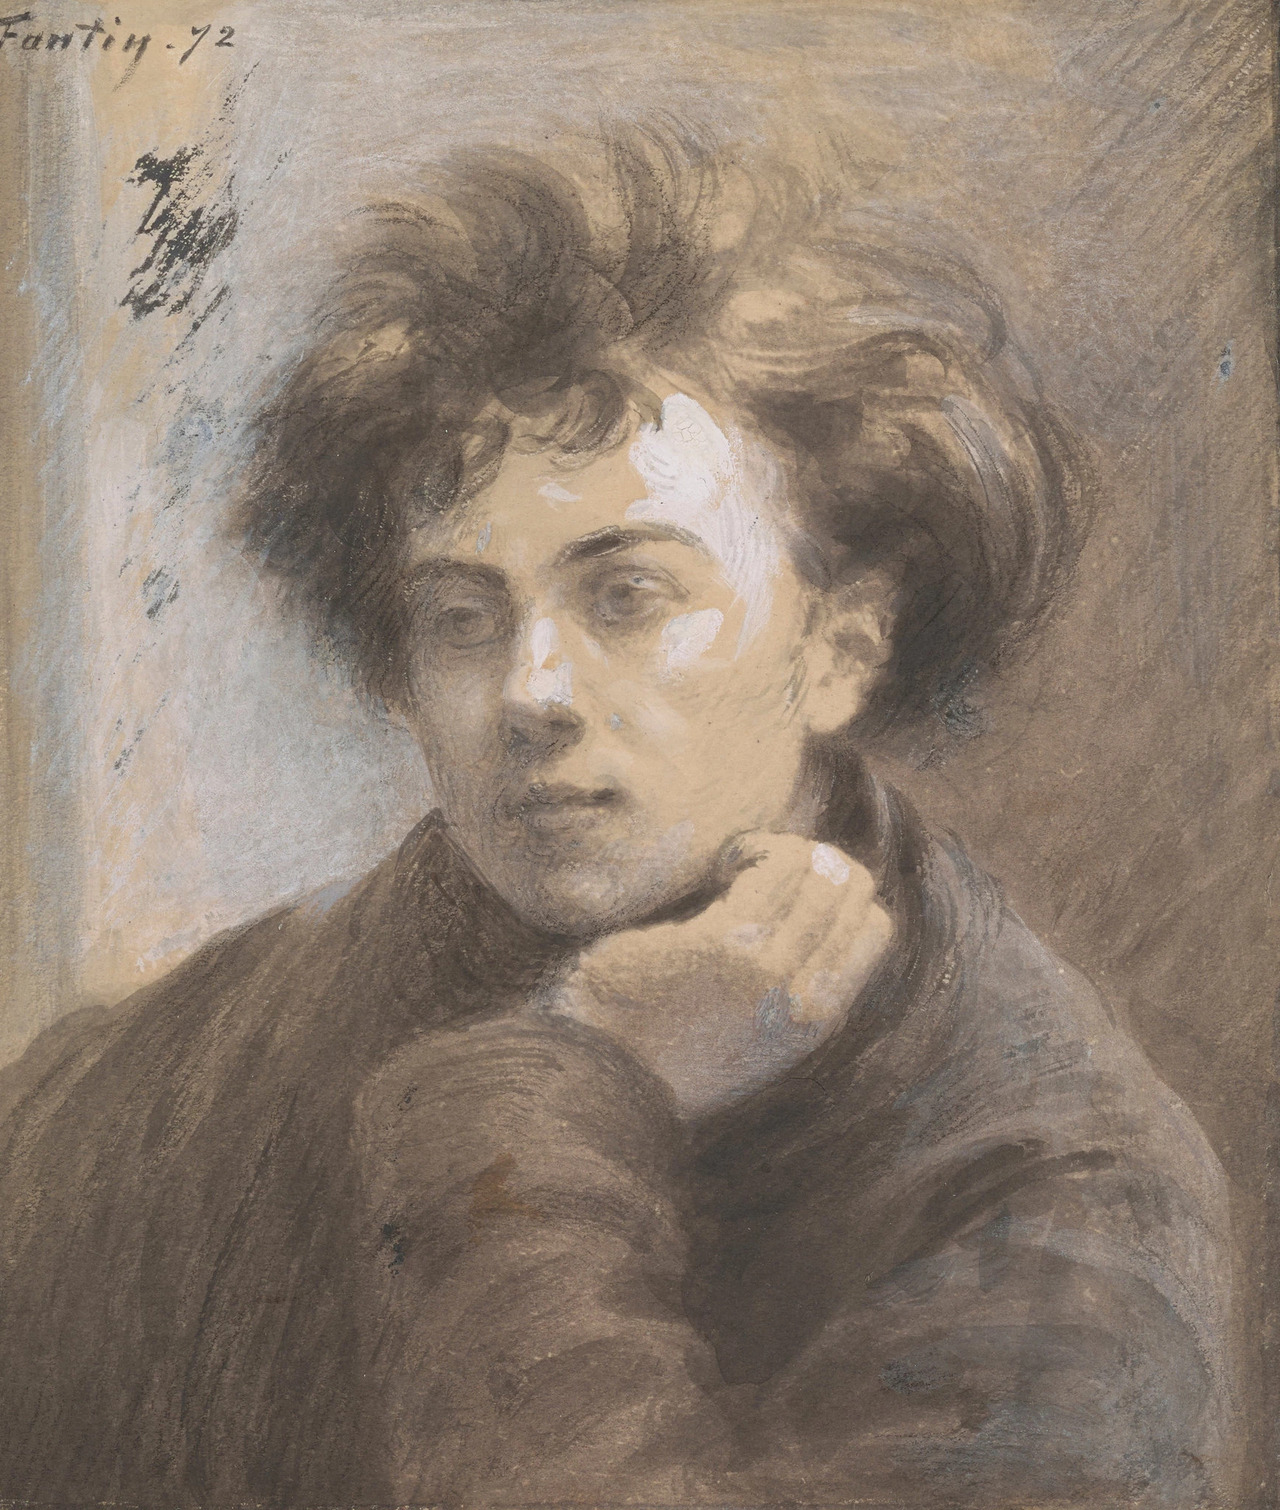 Henri Fantin-Latour, Portrait of Arthur Rimbaud, 1872